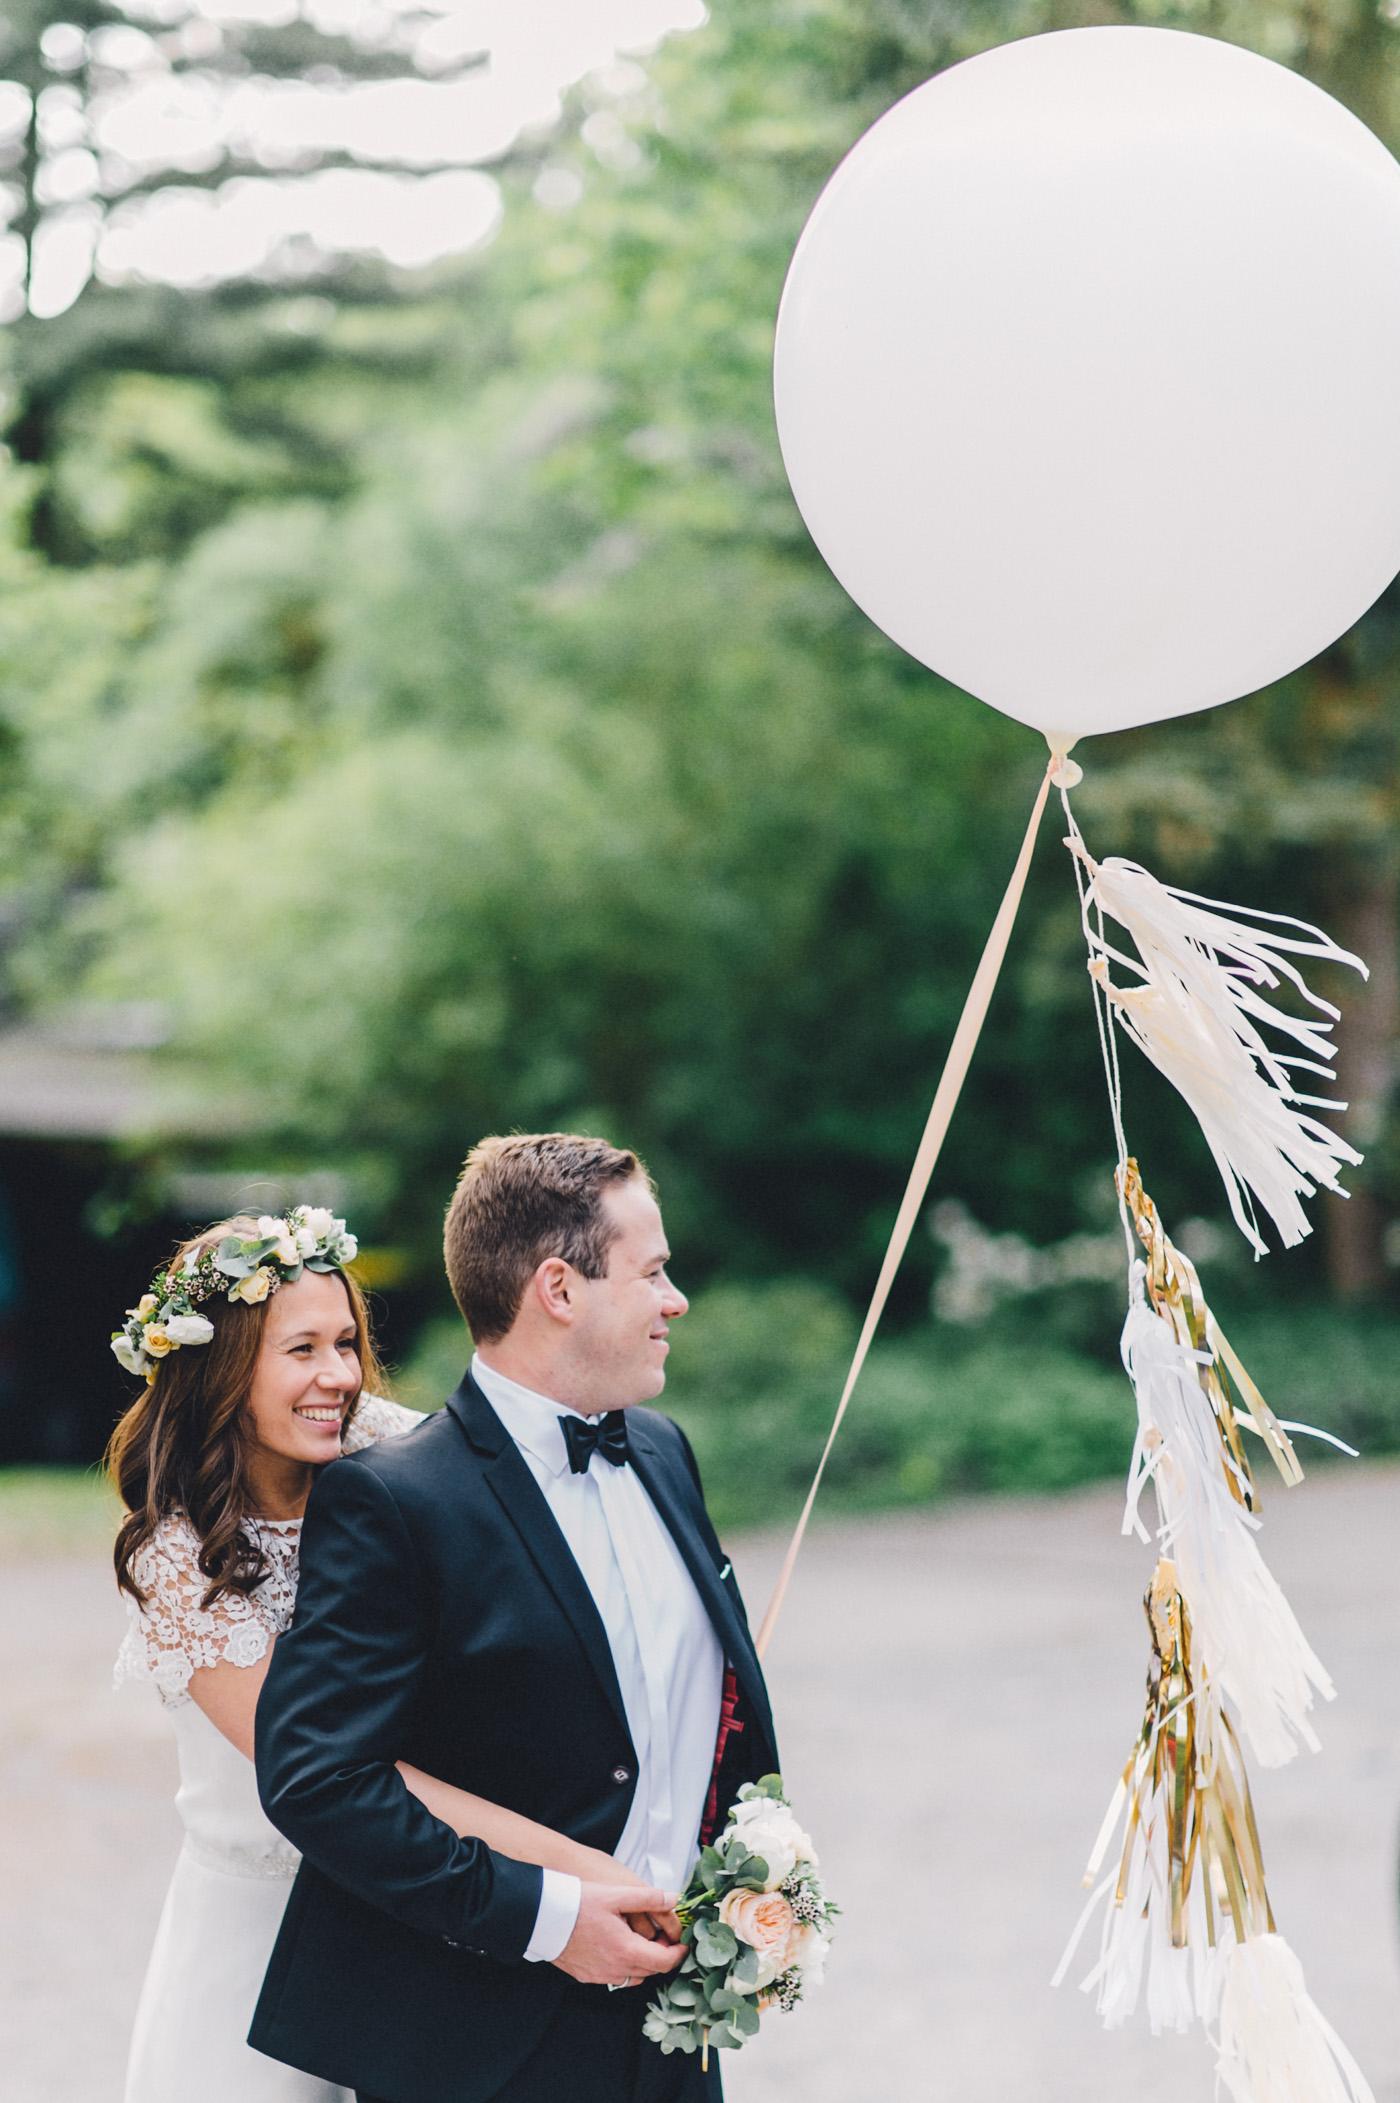 diy-wedding-nothenhof-hoch-6